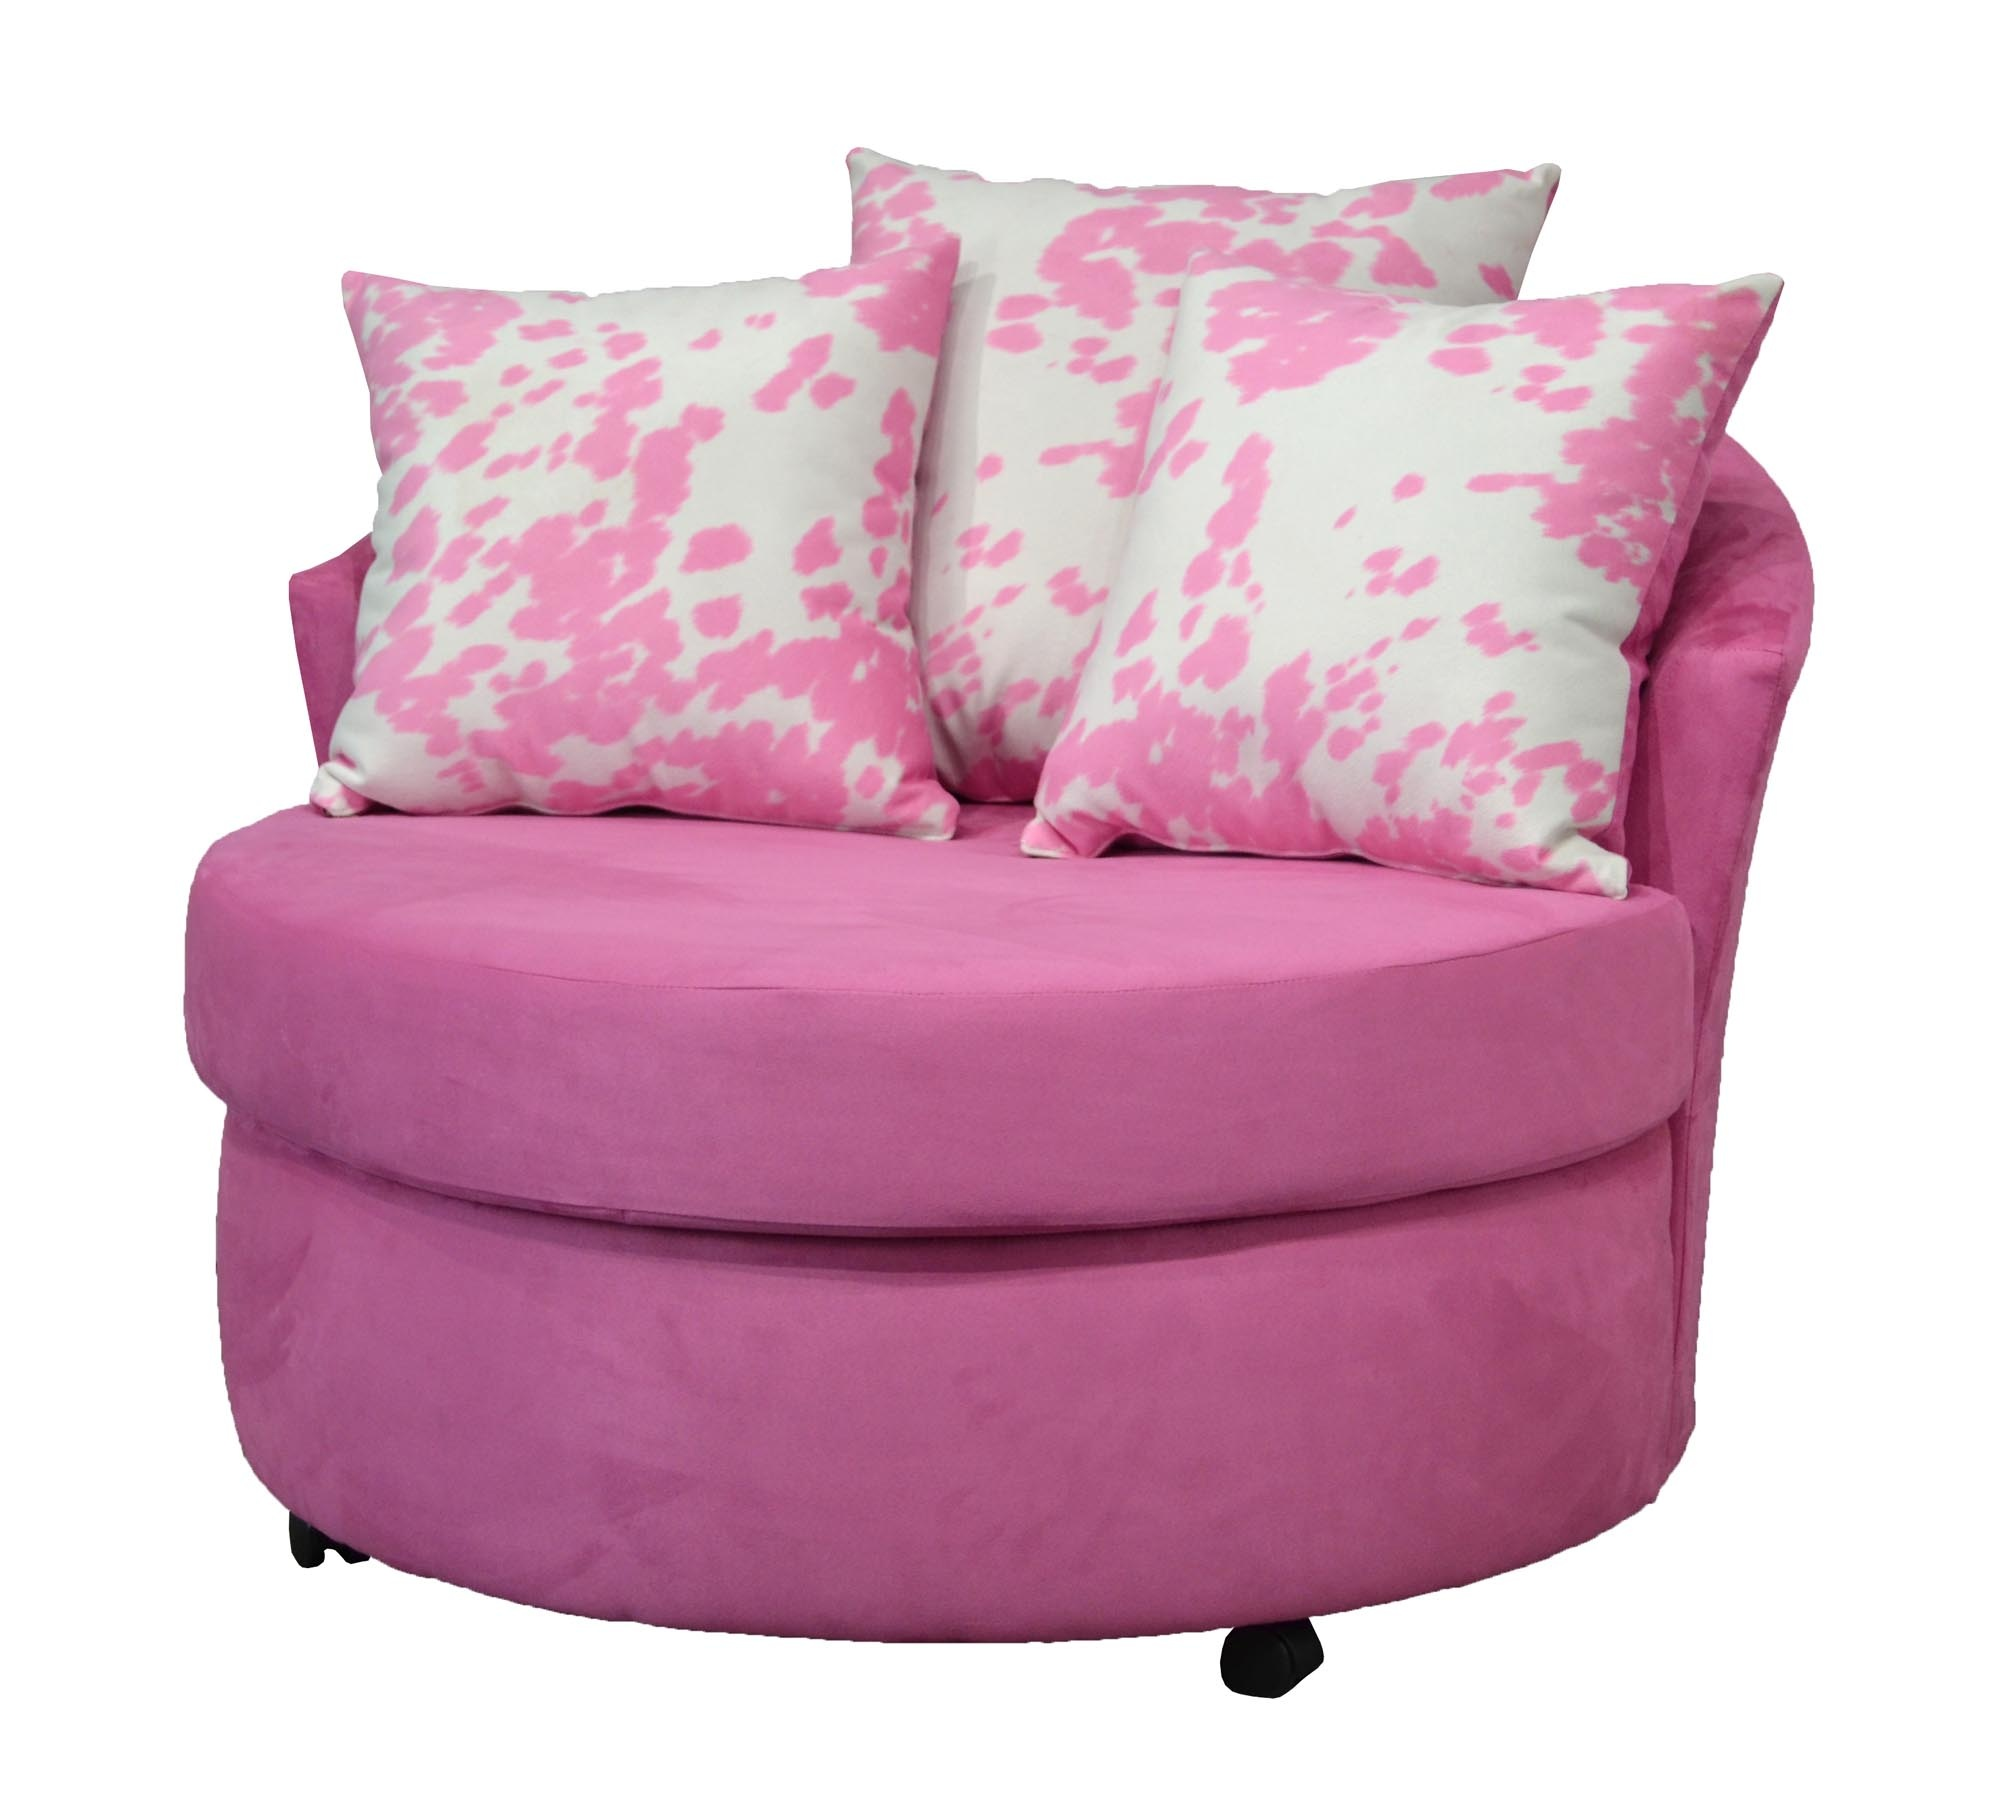 Pink Udder Madness